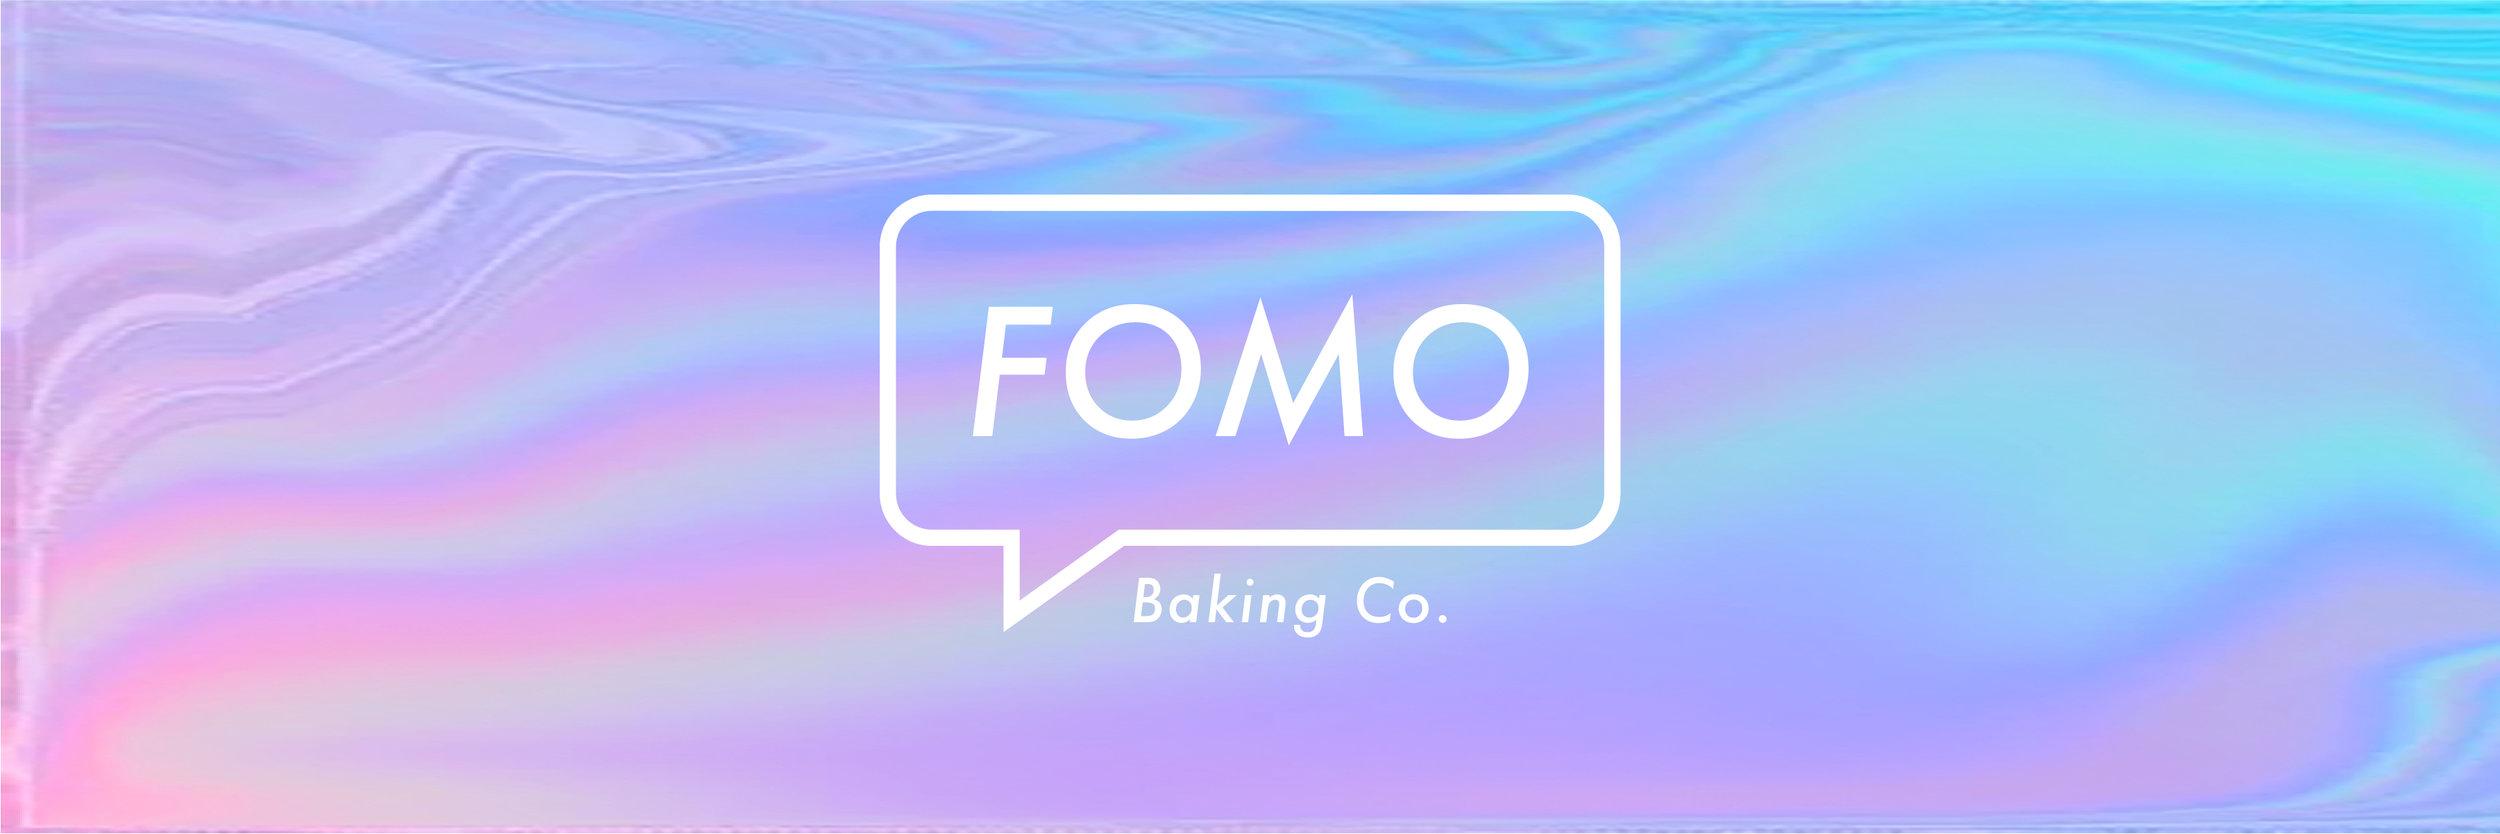 FOMO-Box-Layouts-13.jpg